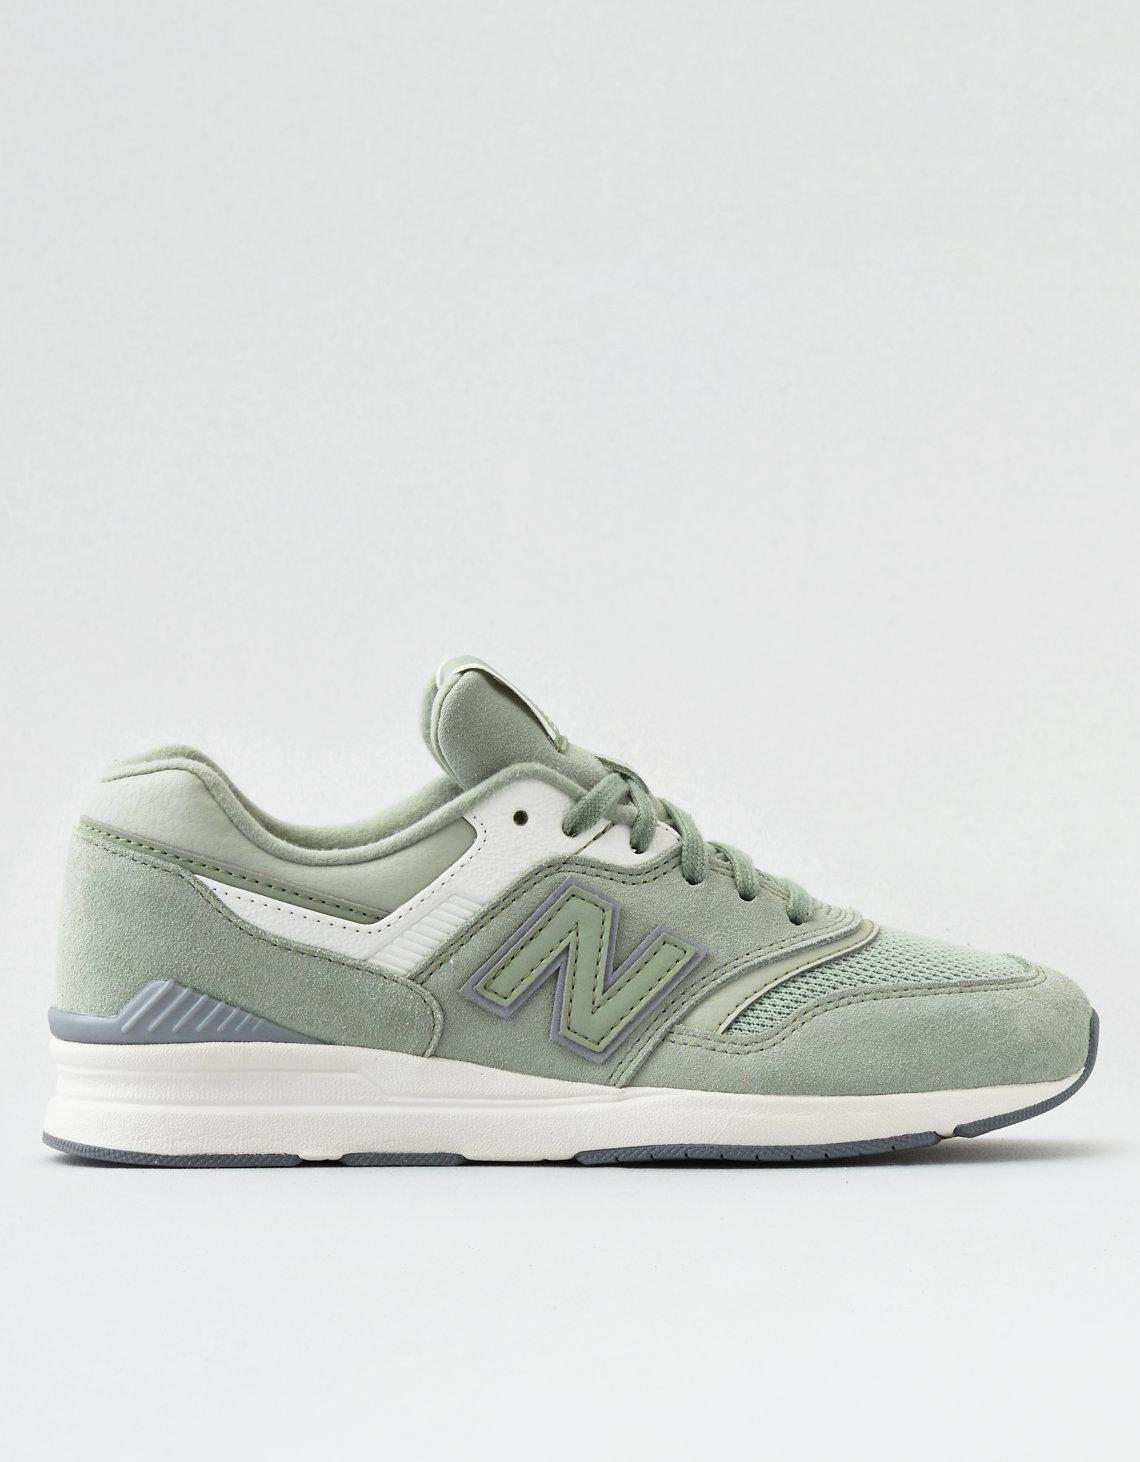 New Balance 697 Sneaker